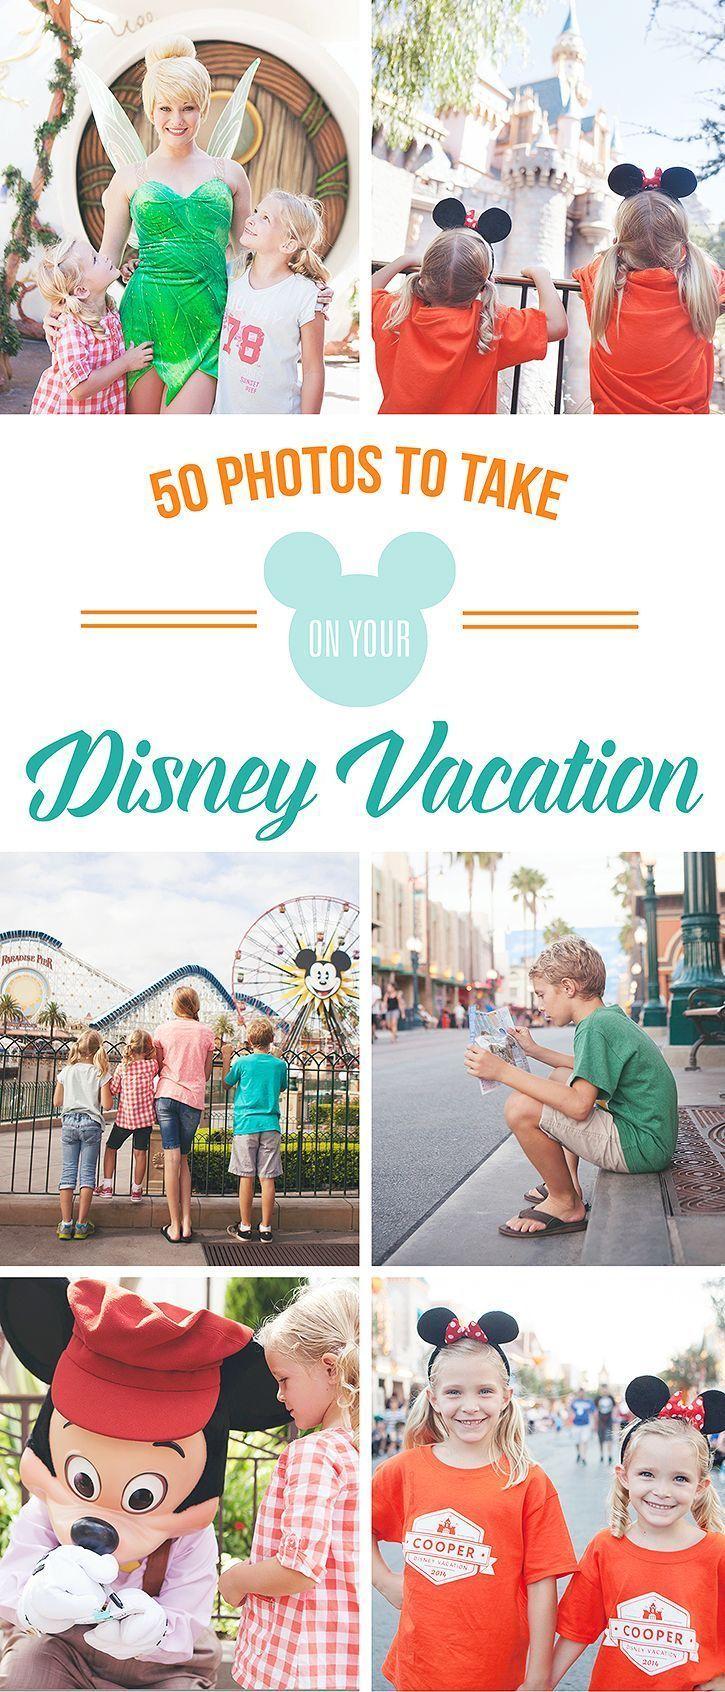 50 Photo suggestions to capture the magic of YOUR Disney Vacation - Free Printable Photo Checklist disneyland #disney #disneyland